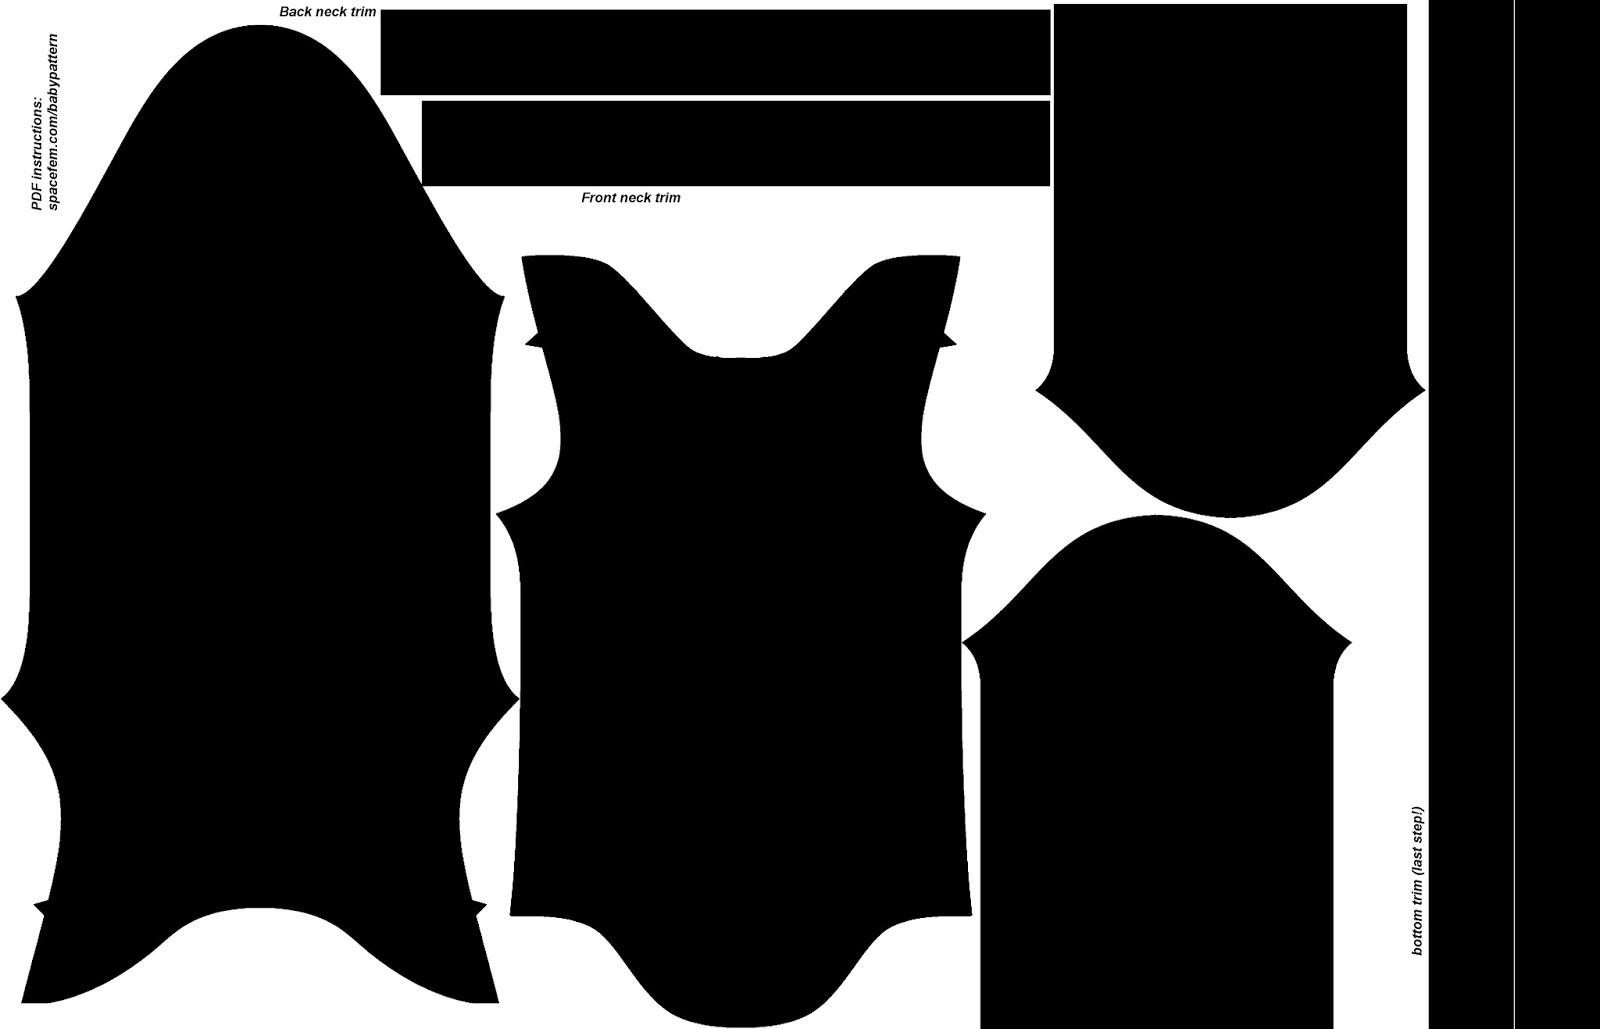 Baby Onesie Template | Spacefem Design Your Own Baby Onesie